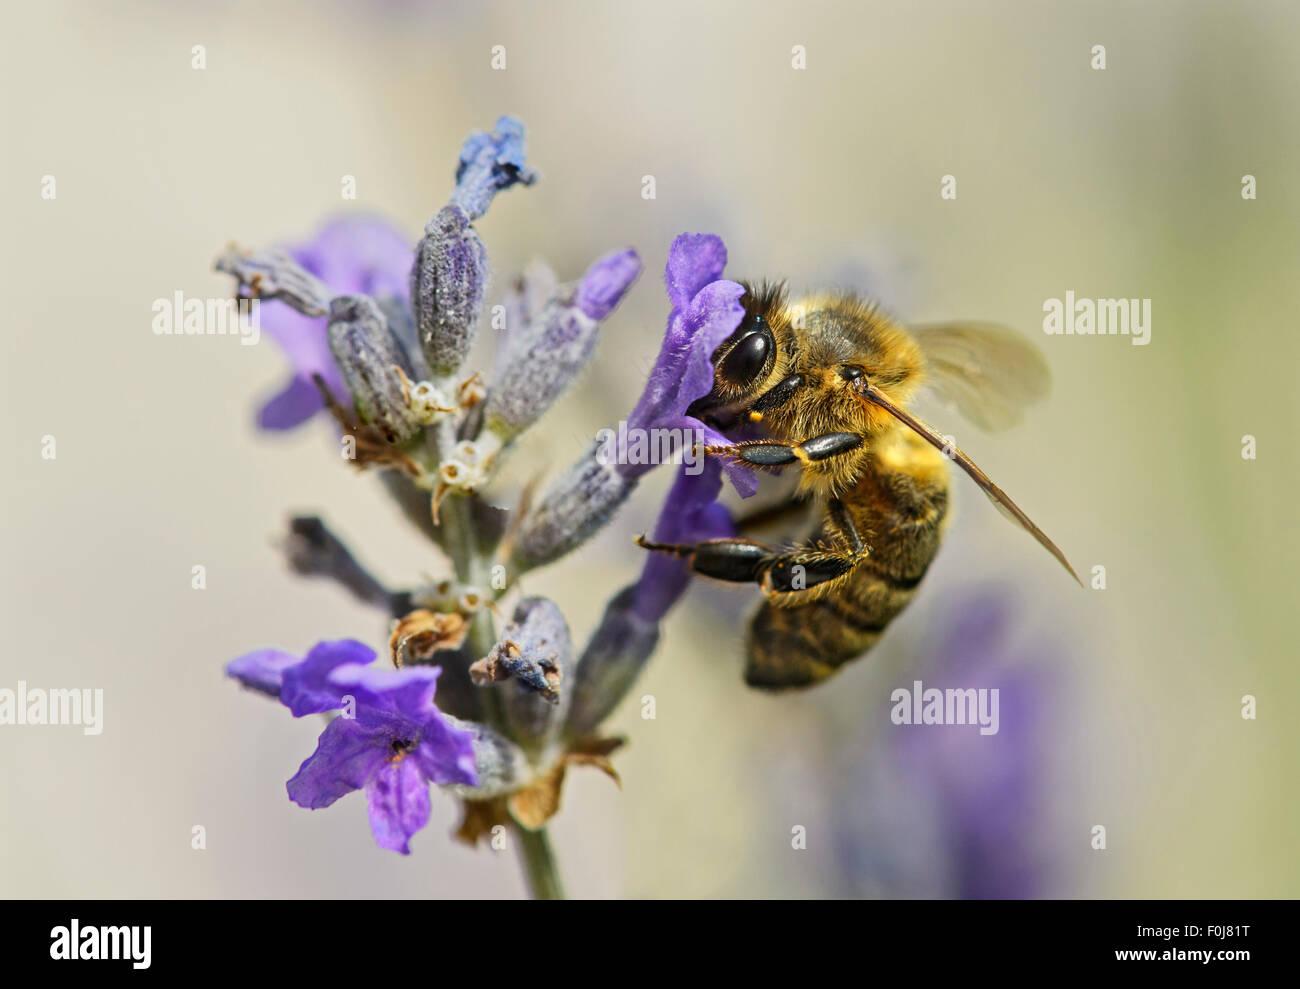 Western honey bee (Apis mellifera) gathering nectar from a lavender flower, bee (Apidae), Switzerland - Stock Image